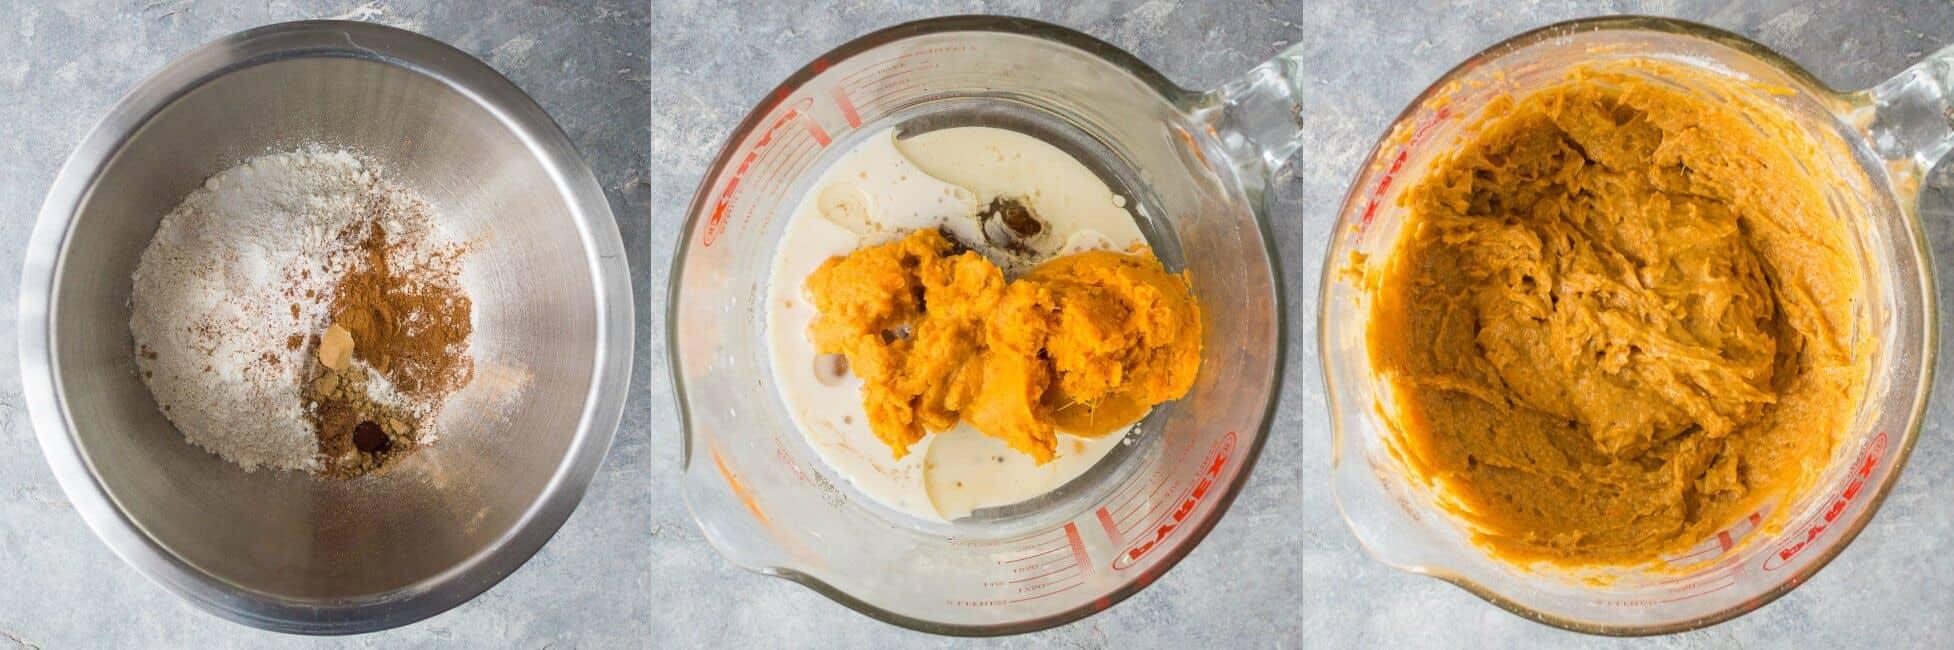 vegan sweet potato bread step 1